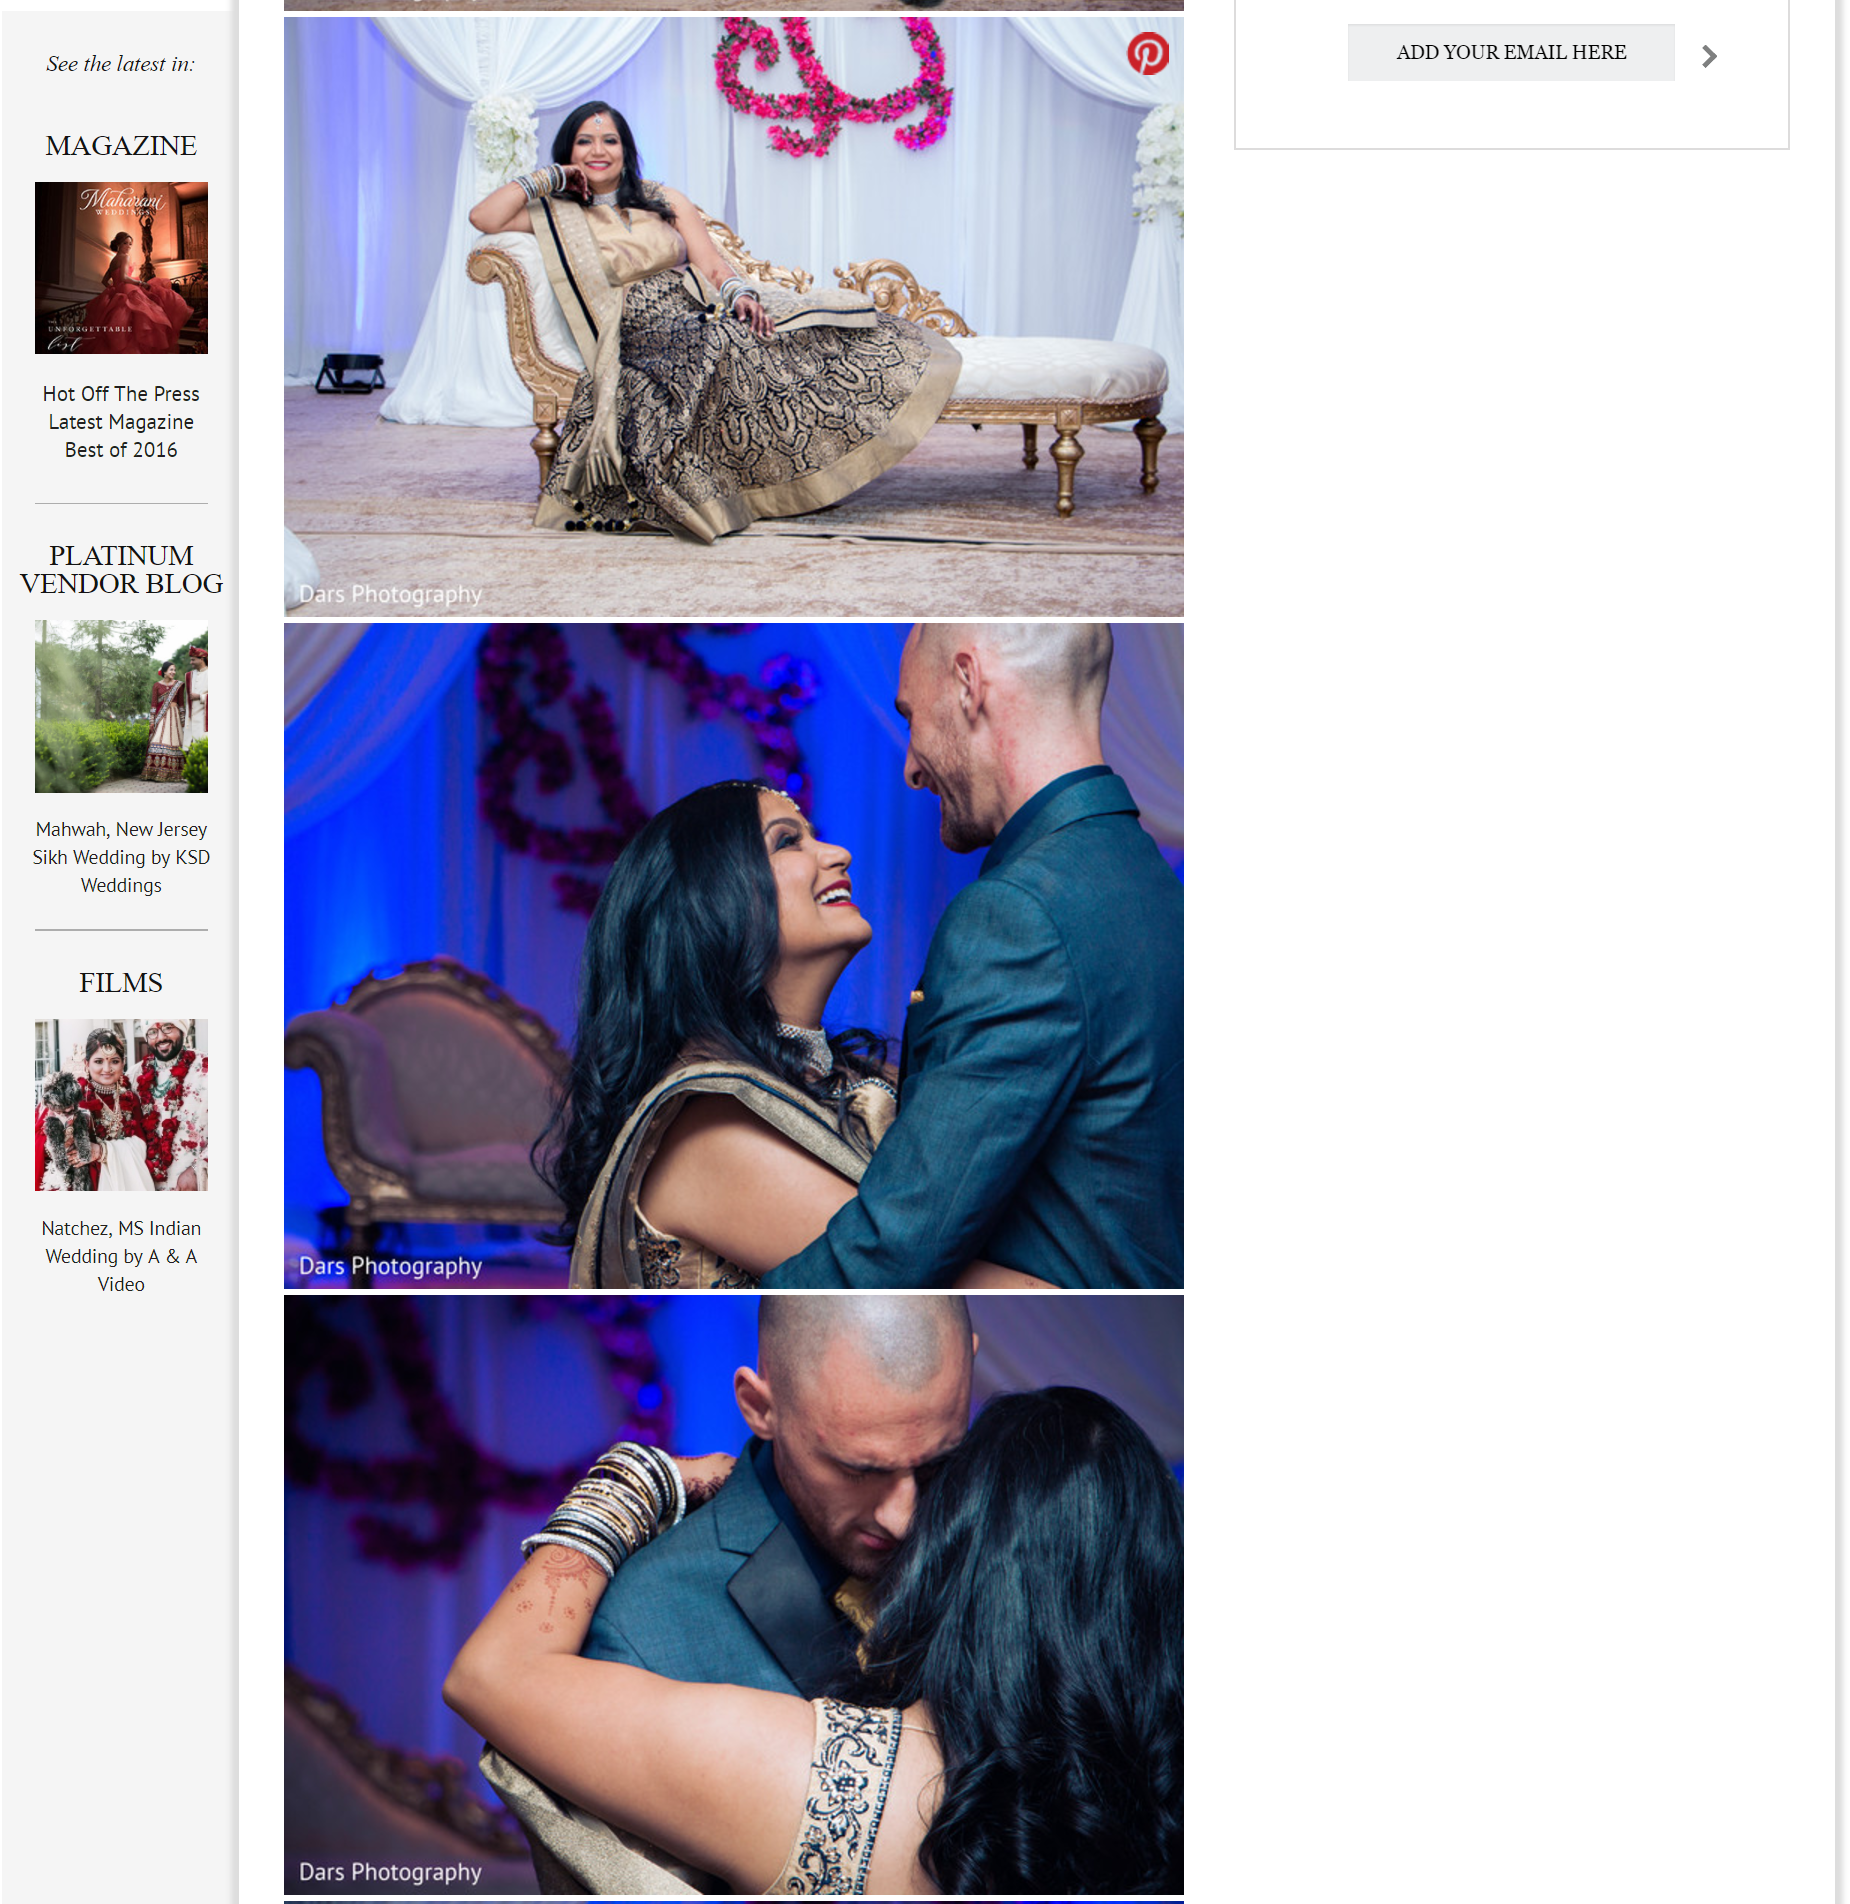 DARS Photography MAHARANI WEDDING FEATURED WEDDING